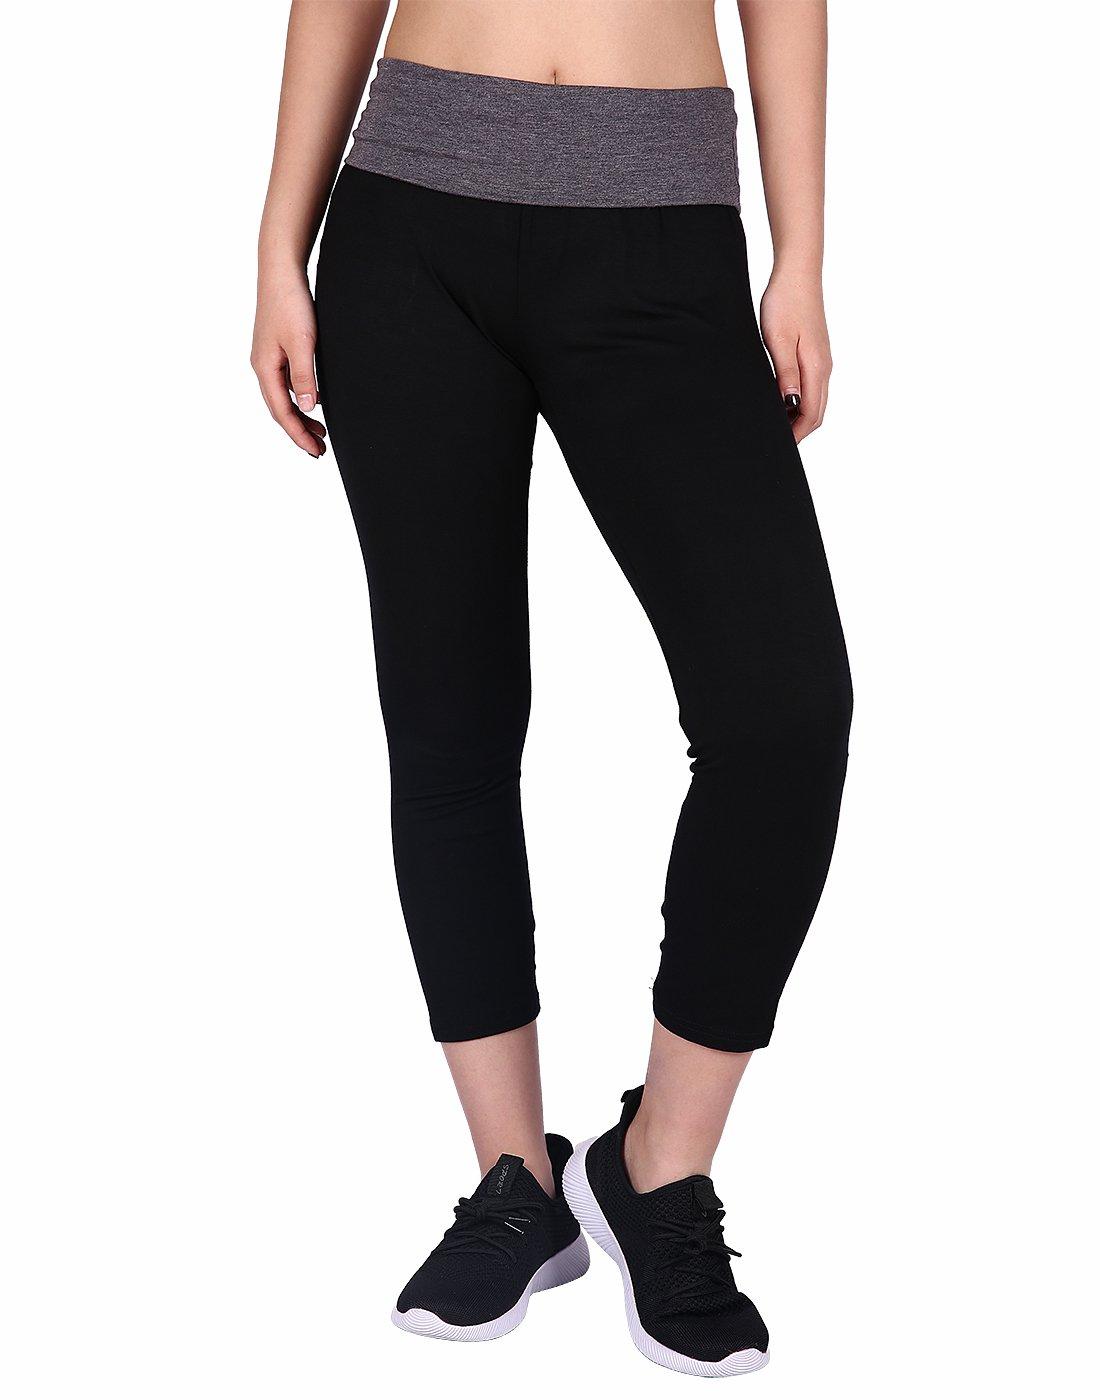 HDE Women's Yoga Capri Pants Color Block Fold Over Waist Workout Leggings (Black w/Charcoal, Large)